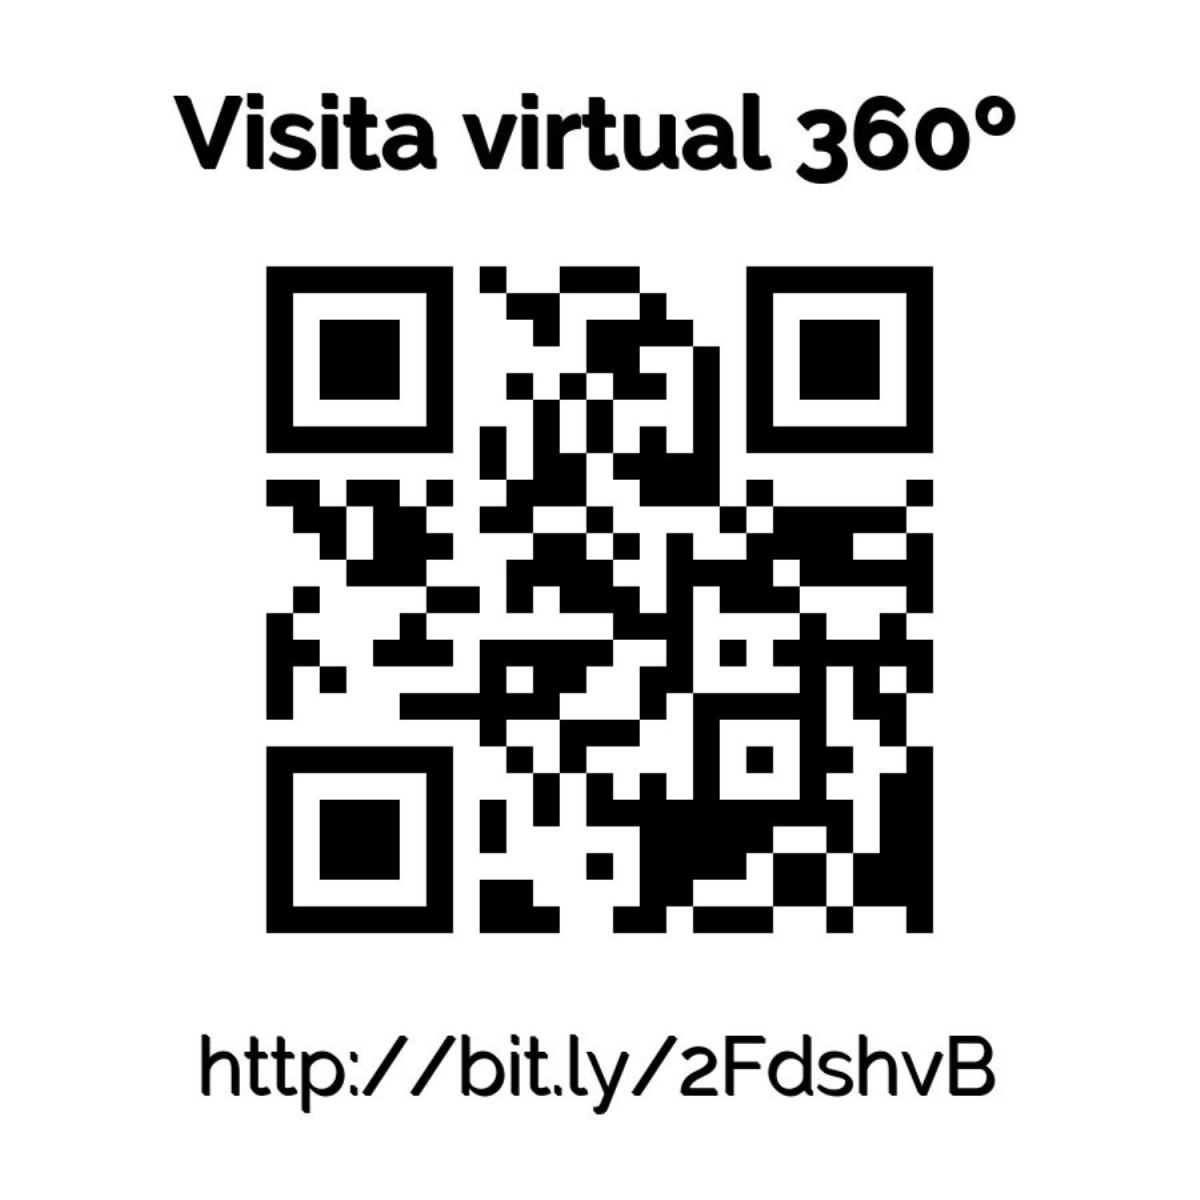 3408-03542